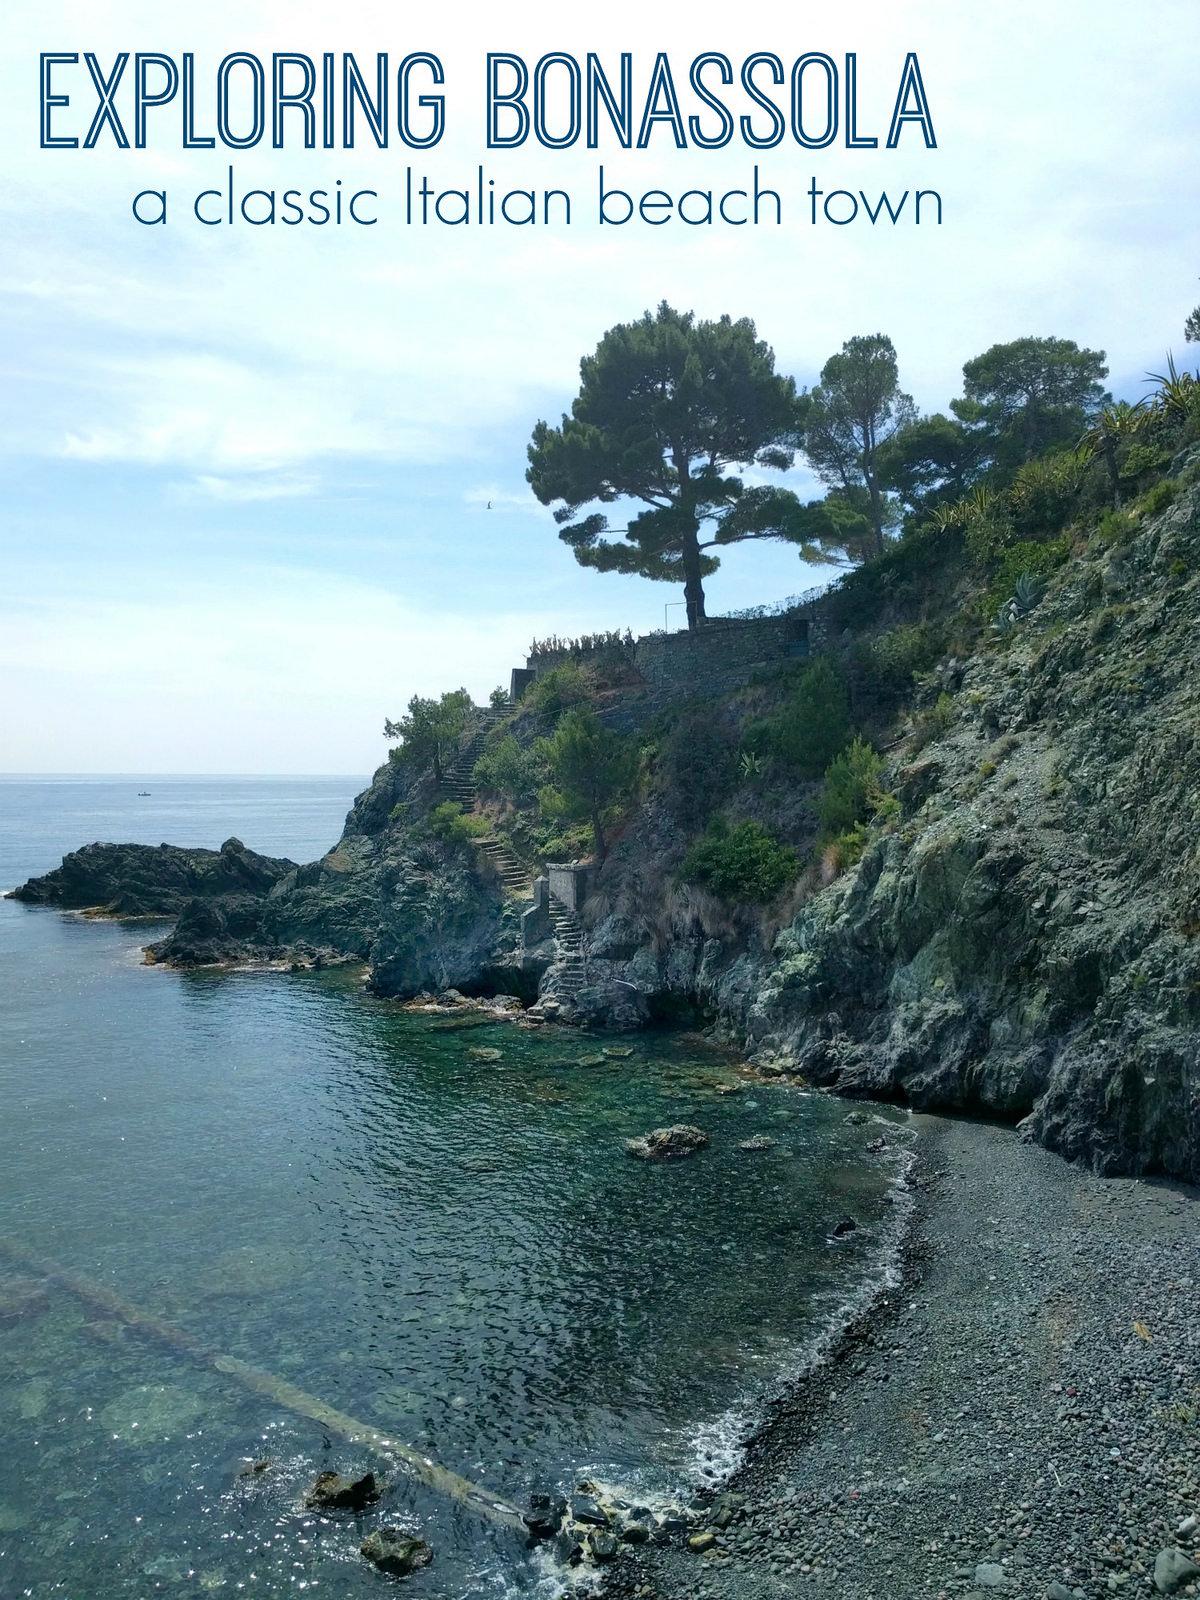 2016 Italy Bonassola Ligurian Beach Town